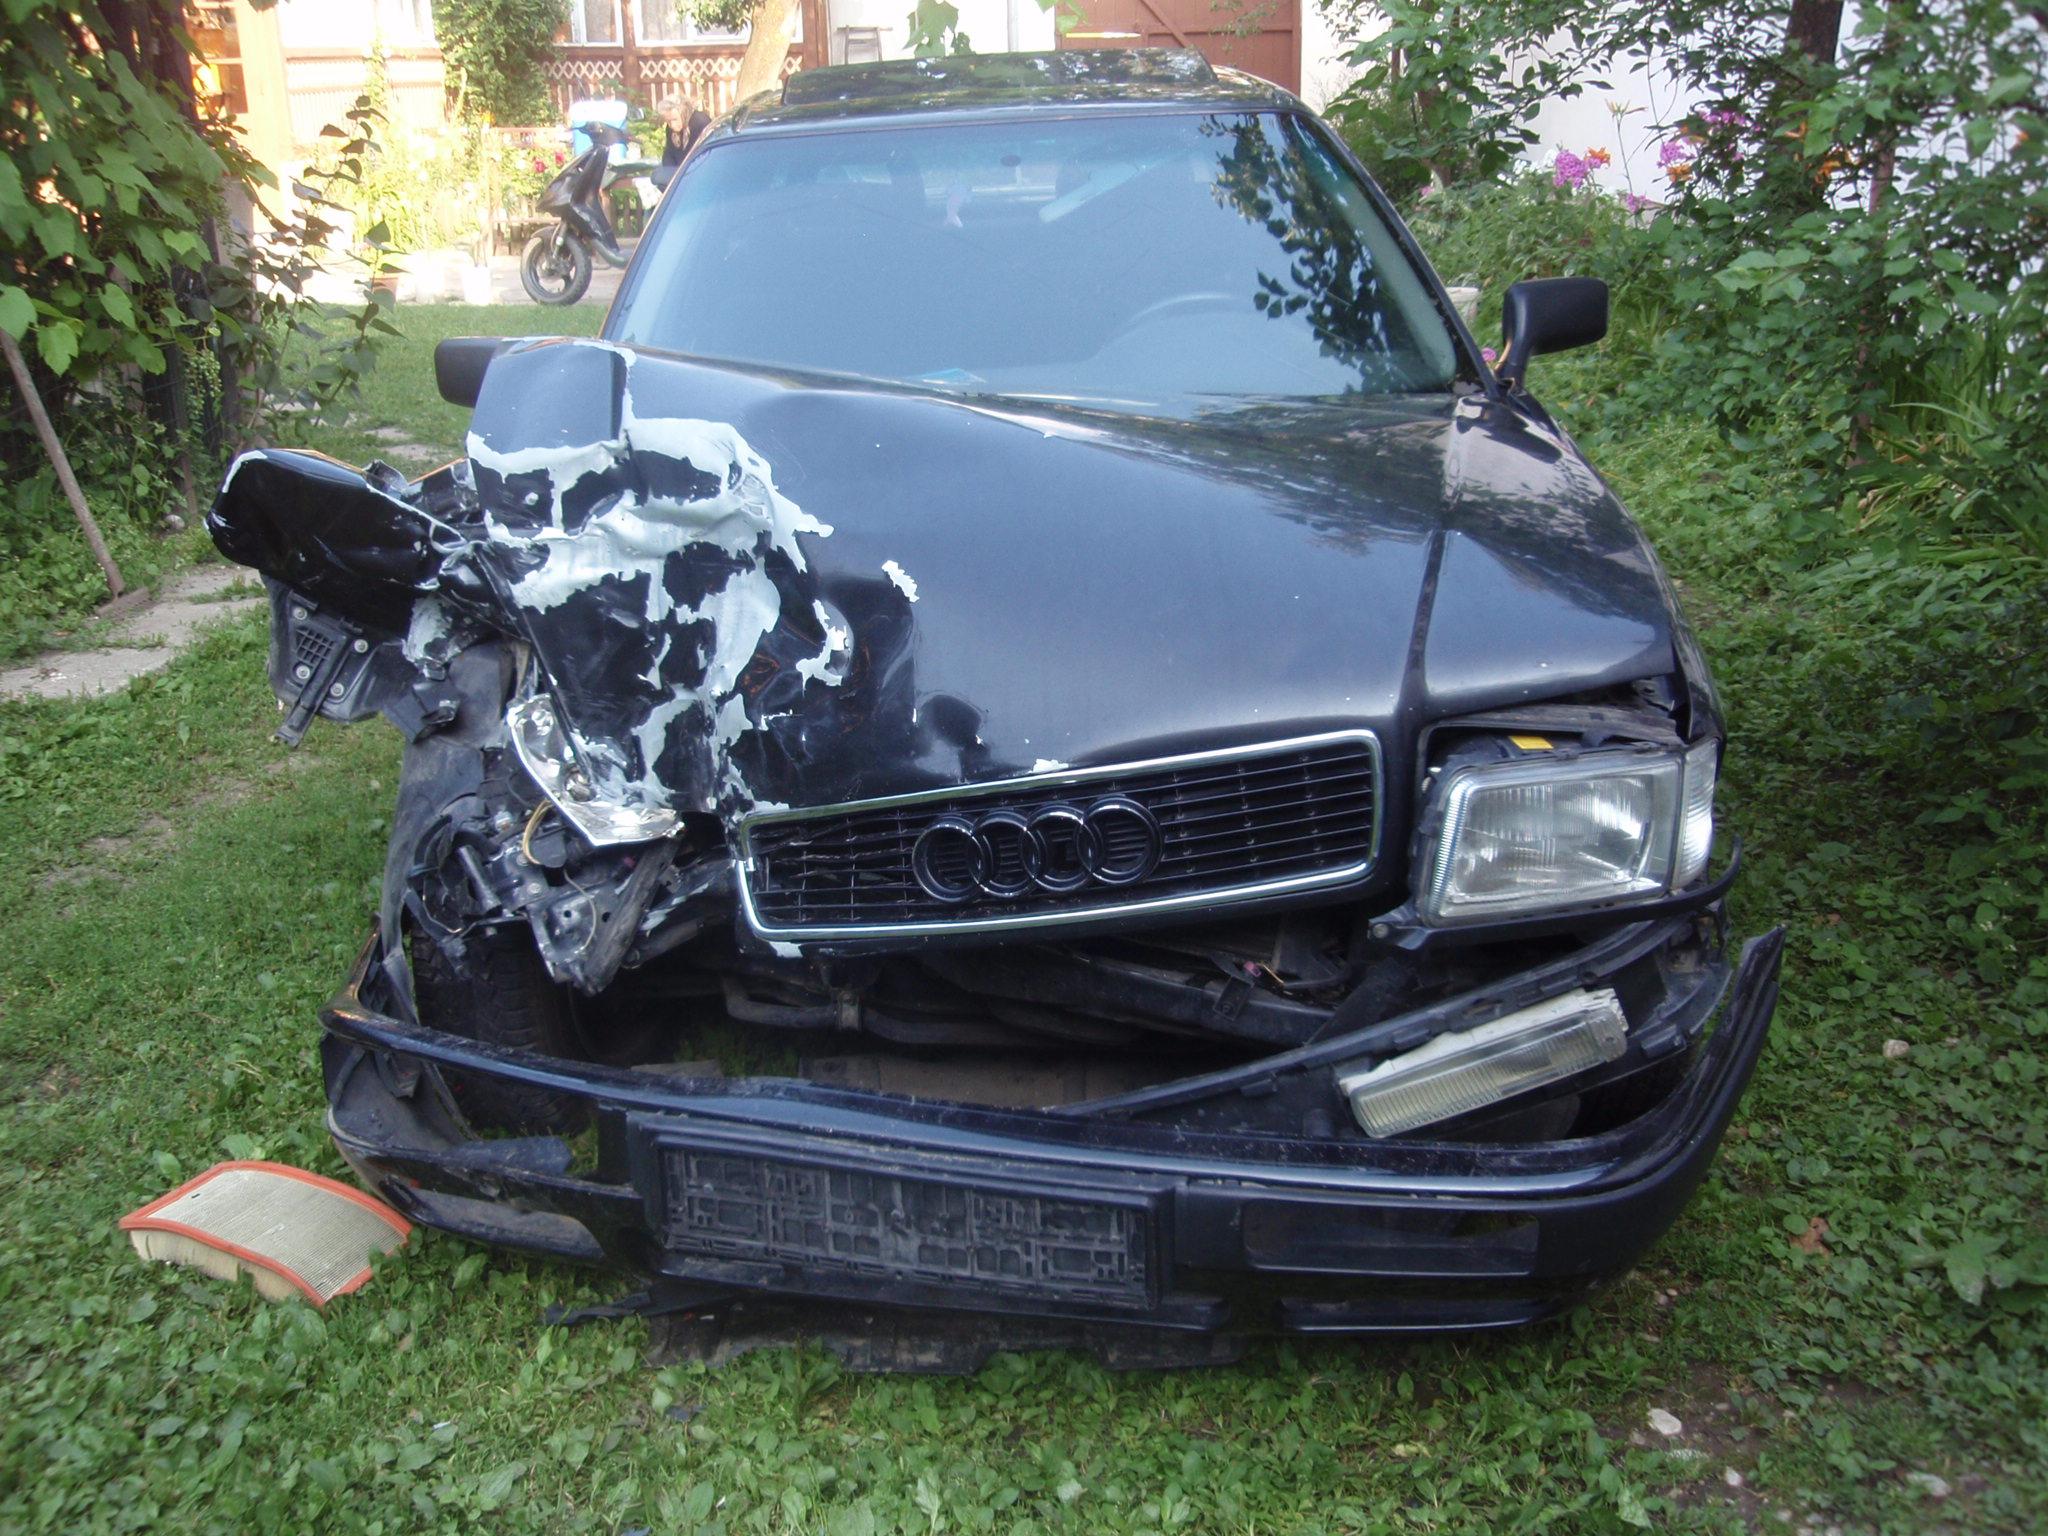 Audi 80 avariat 1993 Benzina Berlina - 25 Iulie 2011 - Poza 5